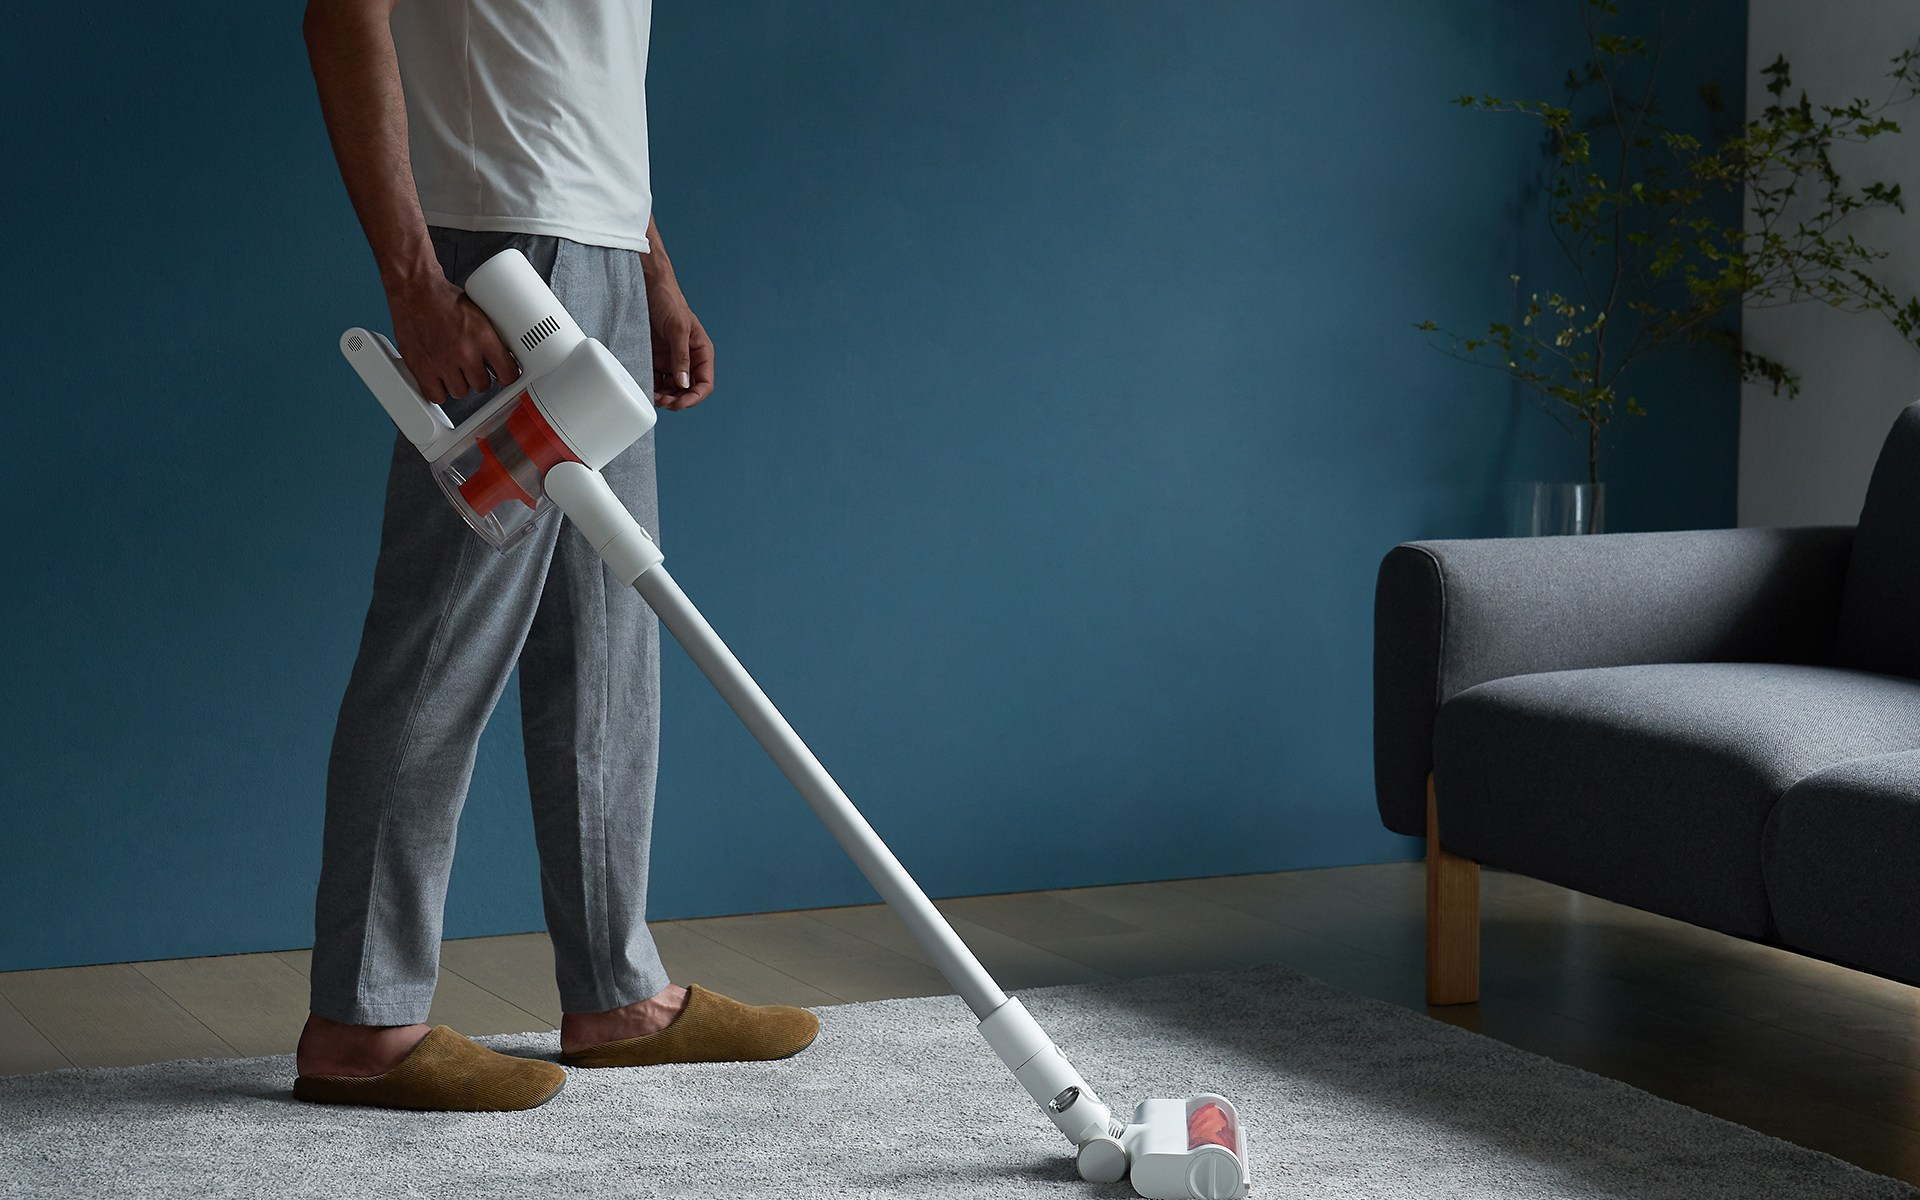 Mi Vacuum Cleaner G10, קרדיט צילום יחצ